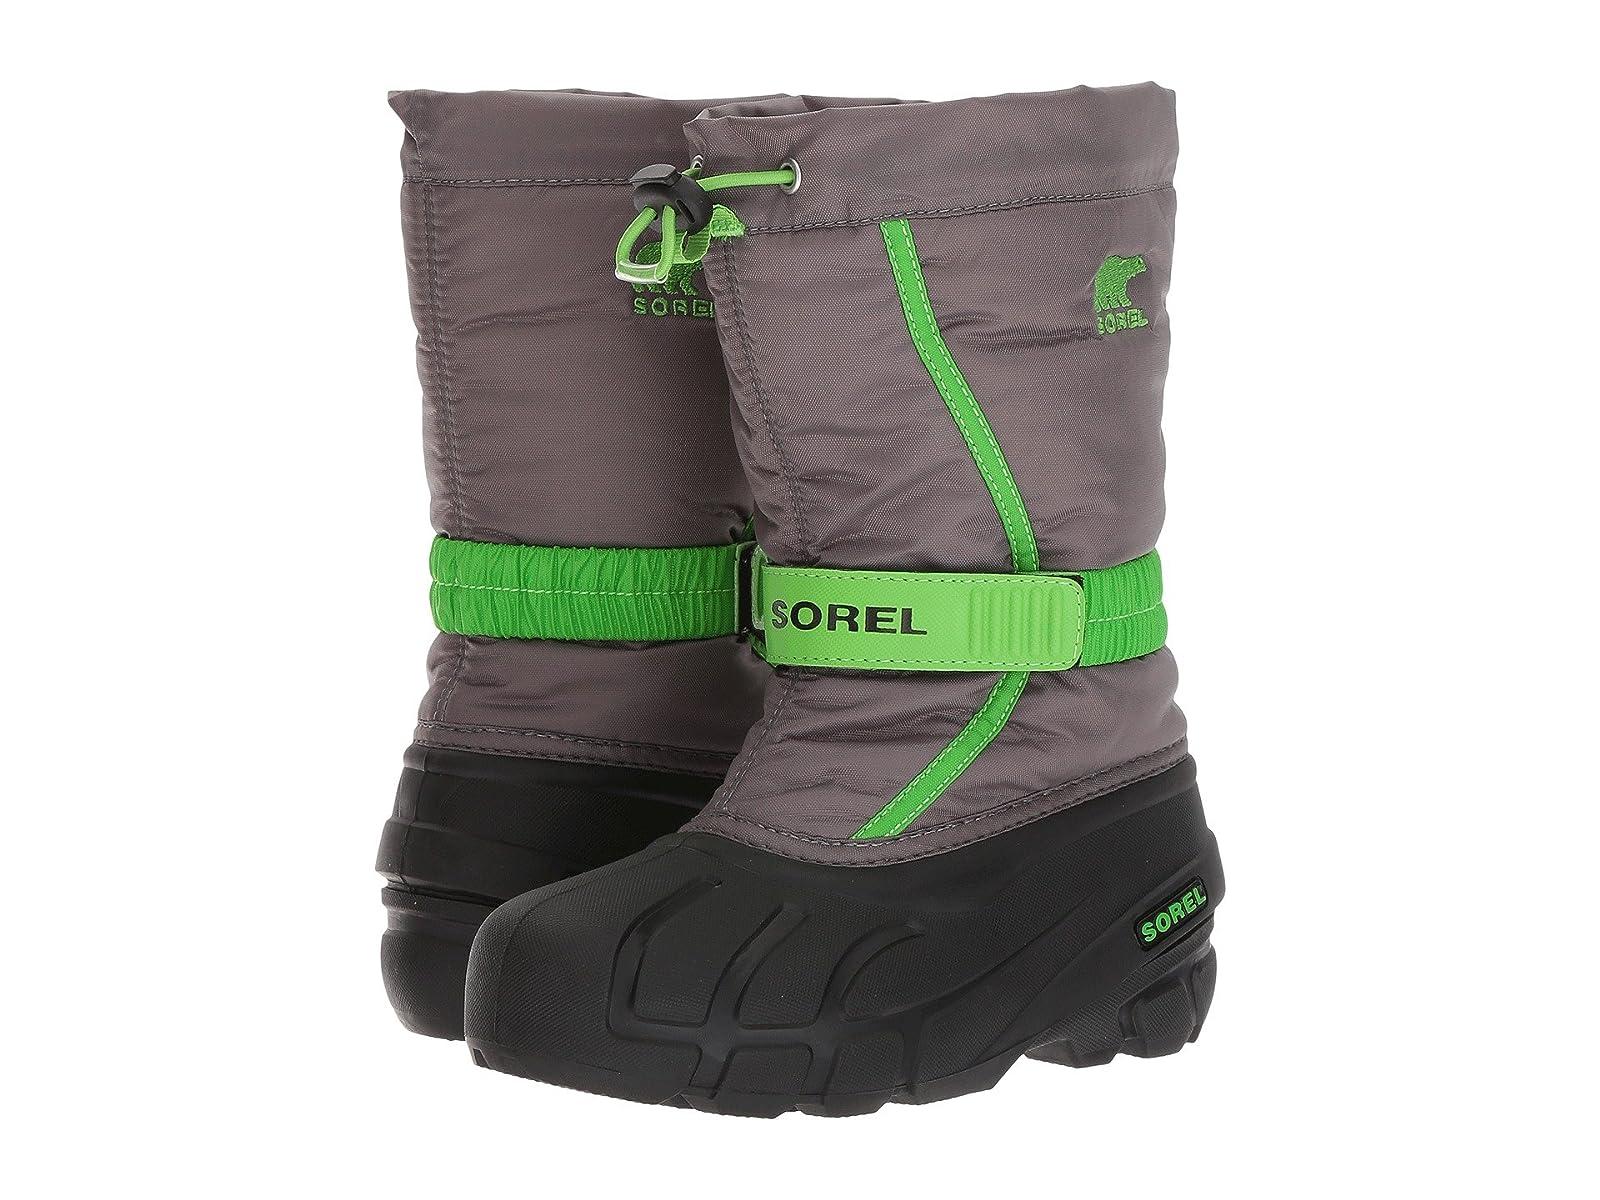 SOREL Kids Flurry (Toddler/Little Kid/Big Kid)Economical and quality shoes